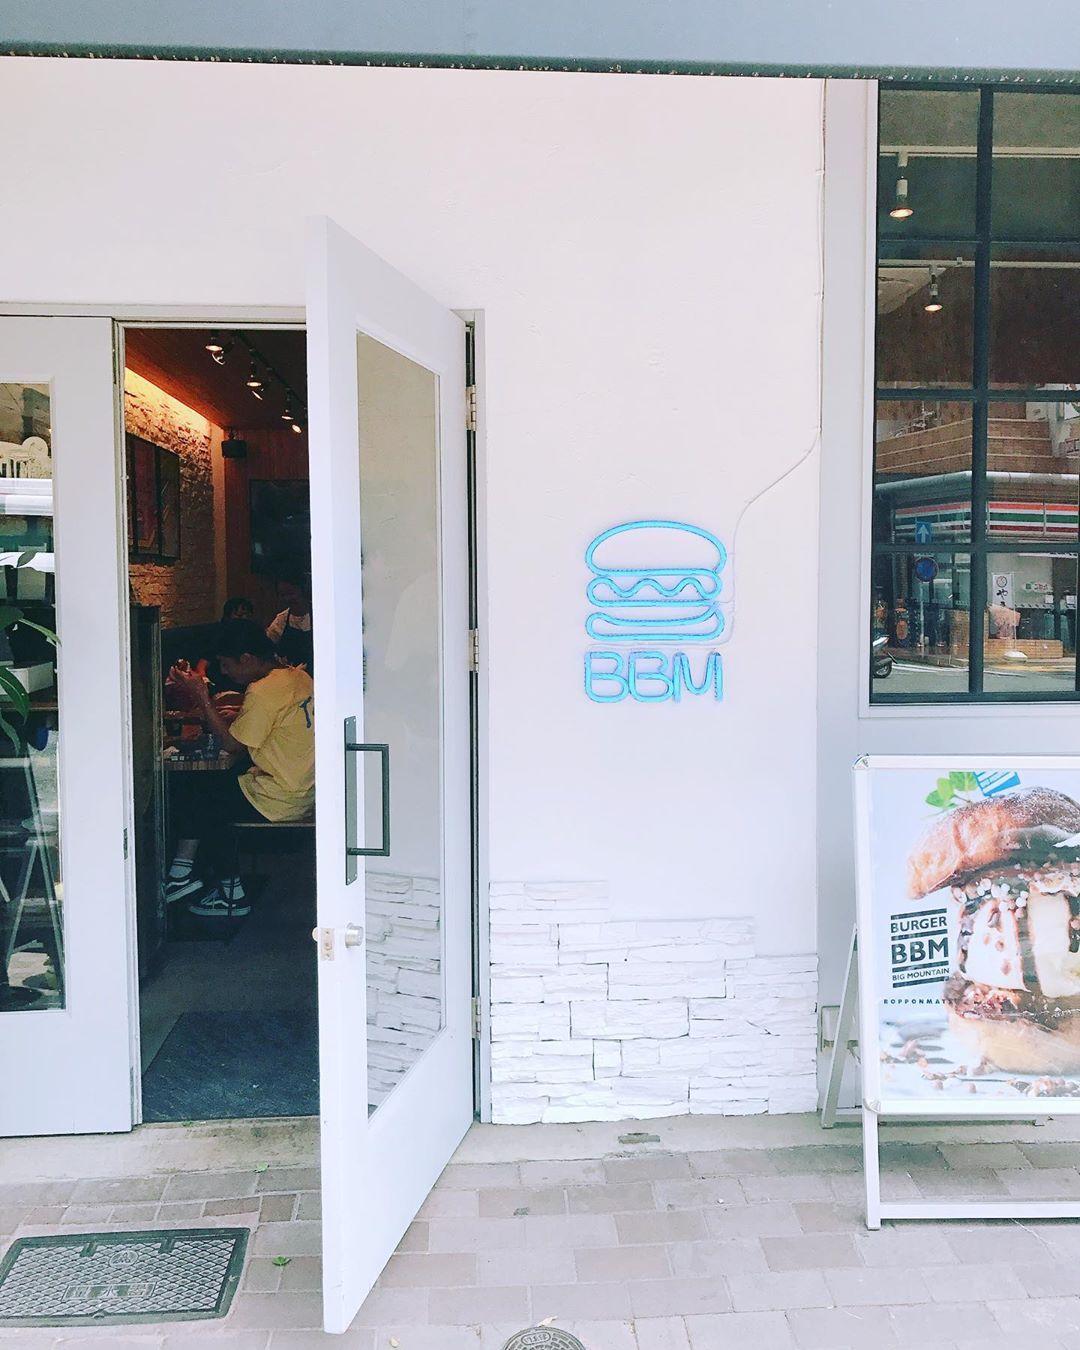 BBM!!!!!!!!!!! B!B!M! なんだ略? ハンバーガー